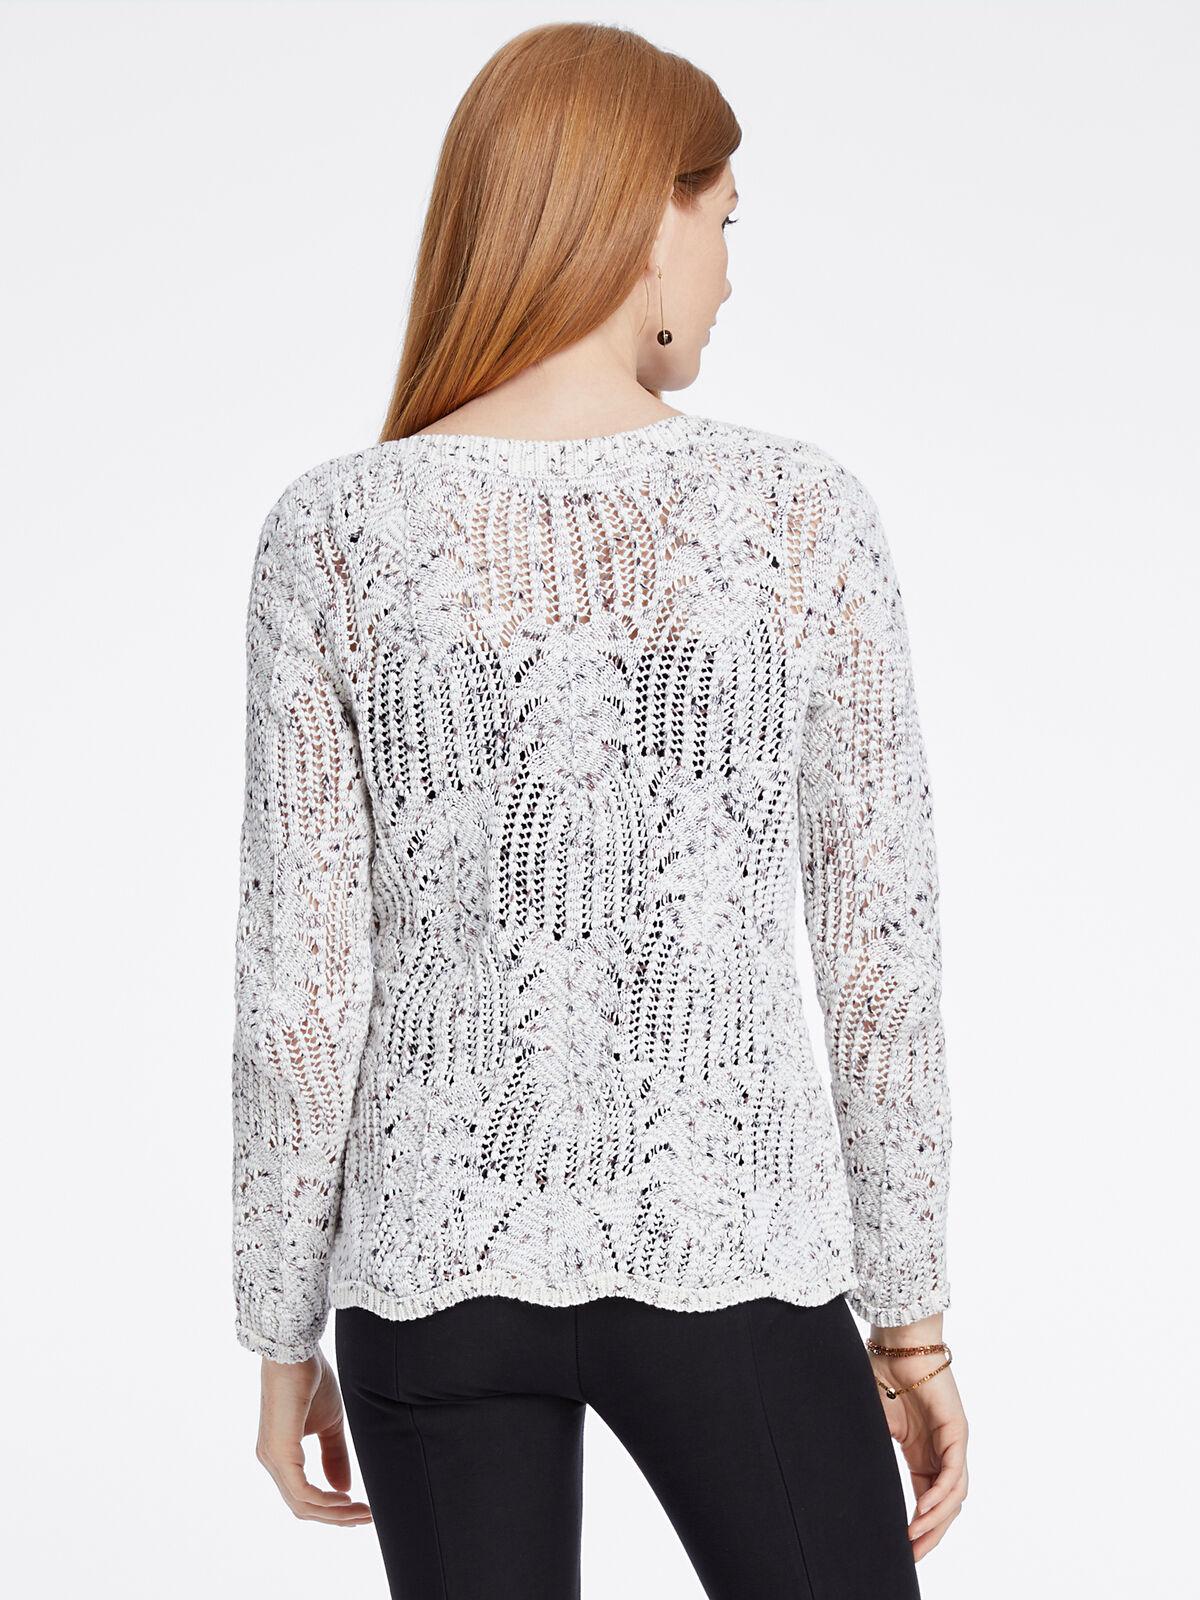 In Stitches Sweater